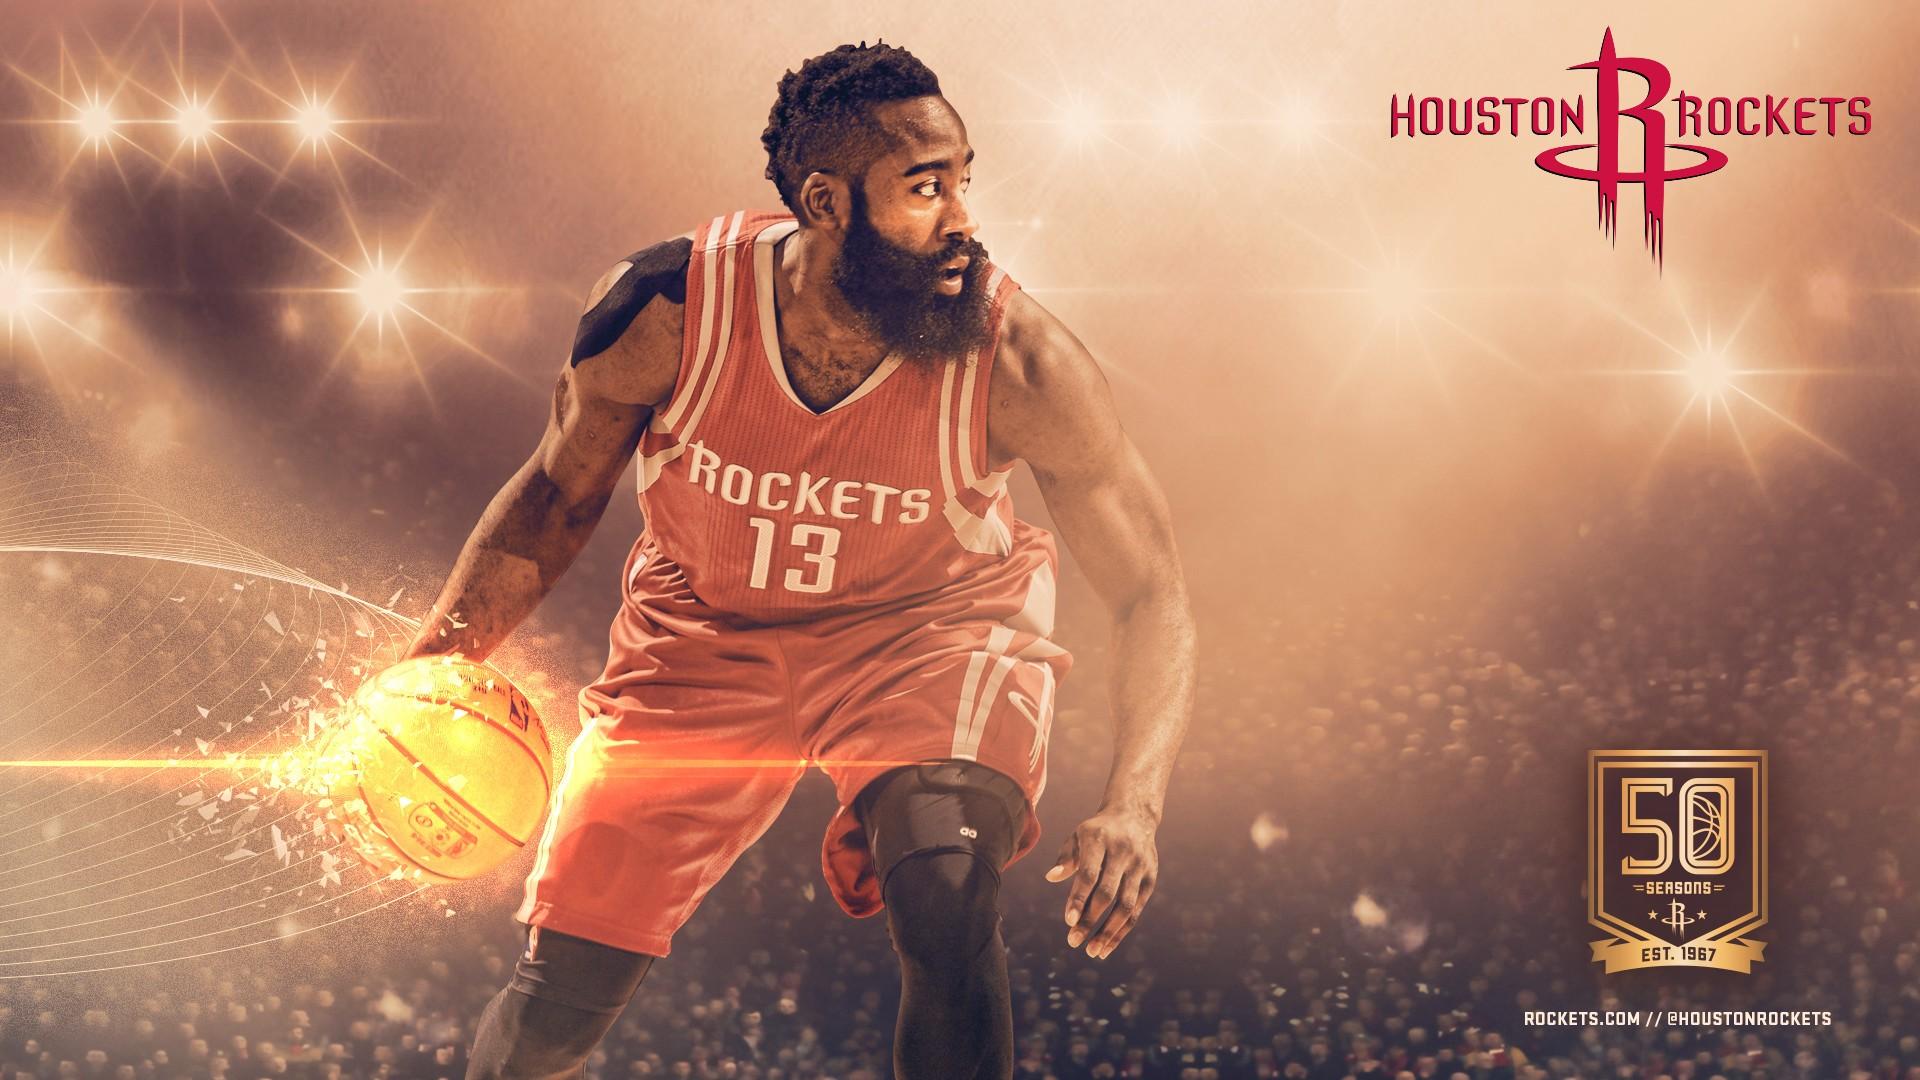 James Harden Desktop Wallpaper 2019 Basketball Wallpaper 1920x1080